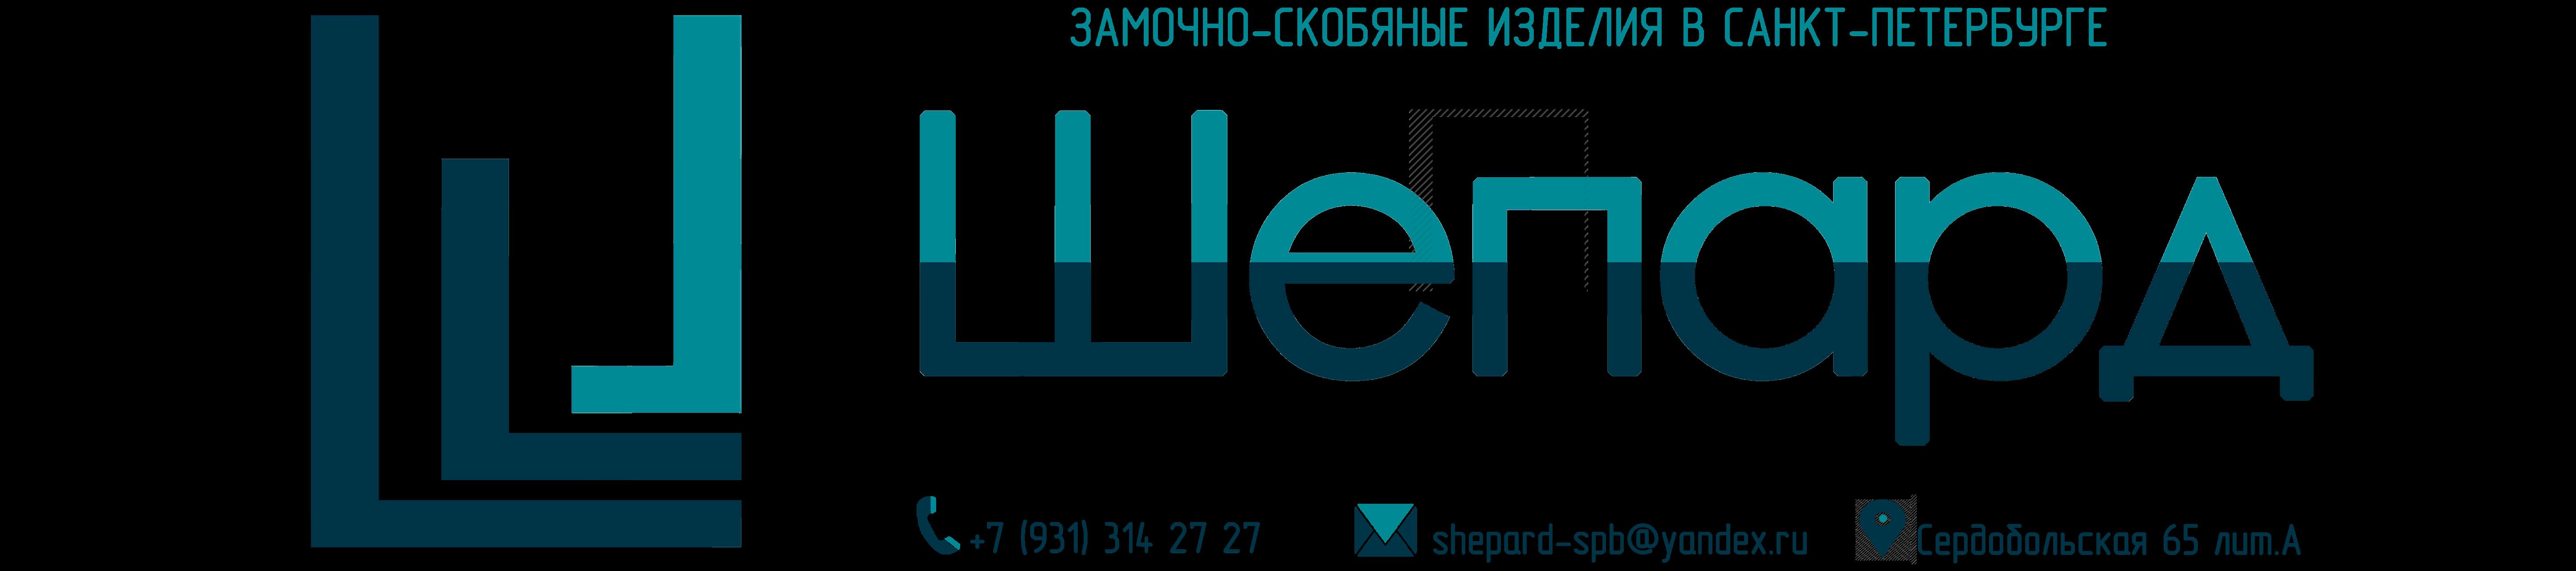 Шепард.рф